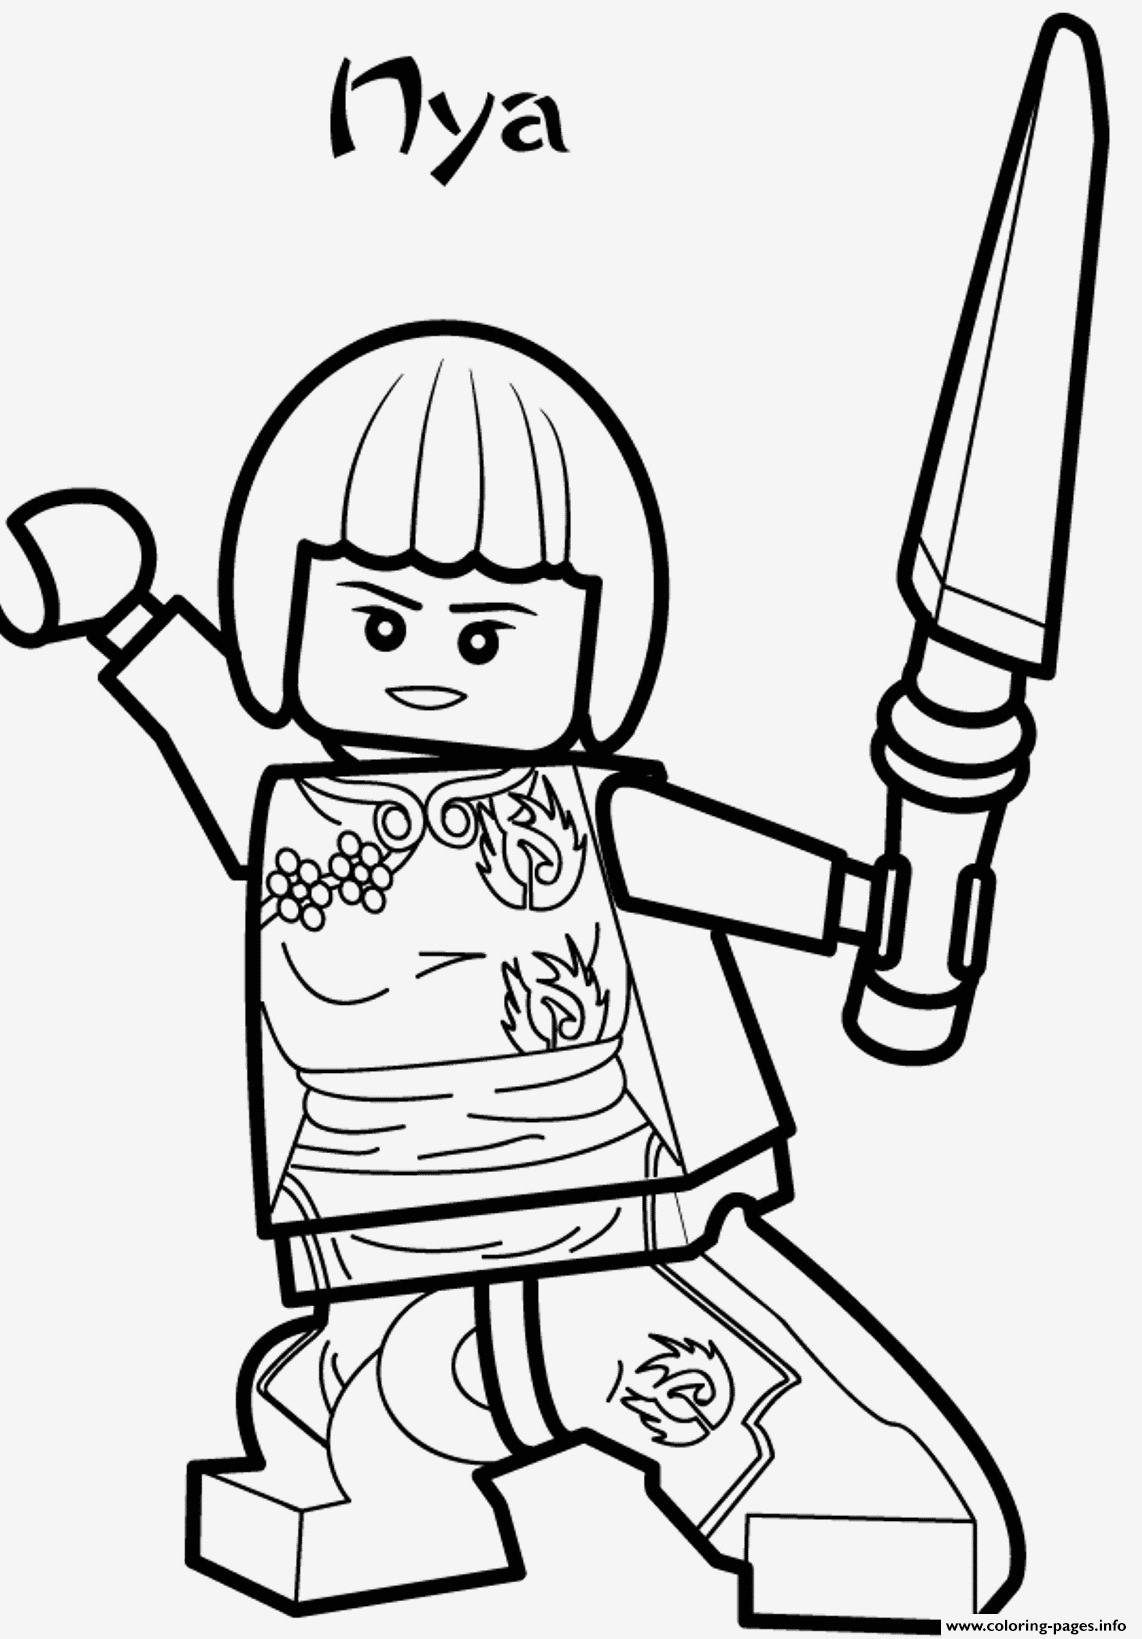 Lego Ausmalbilder Zum Ausdrucken Einzigartig Lego Ninjago Ausmalbild Bilder Zum Ausmalen Bekommen Ninjago Jay Fotografieren